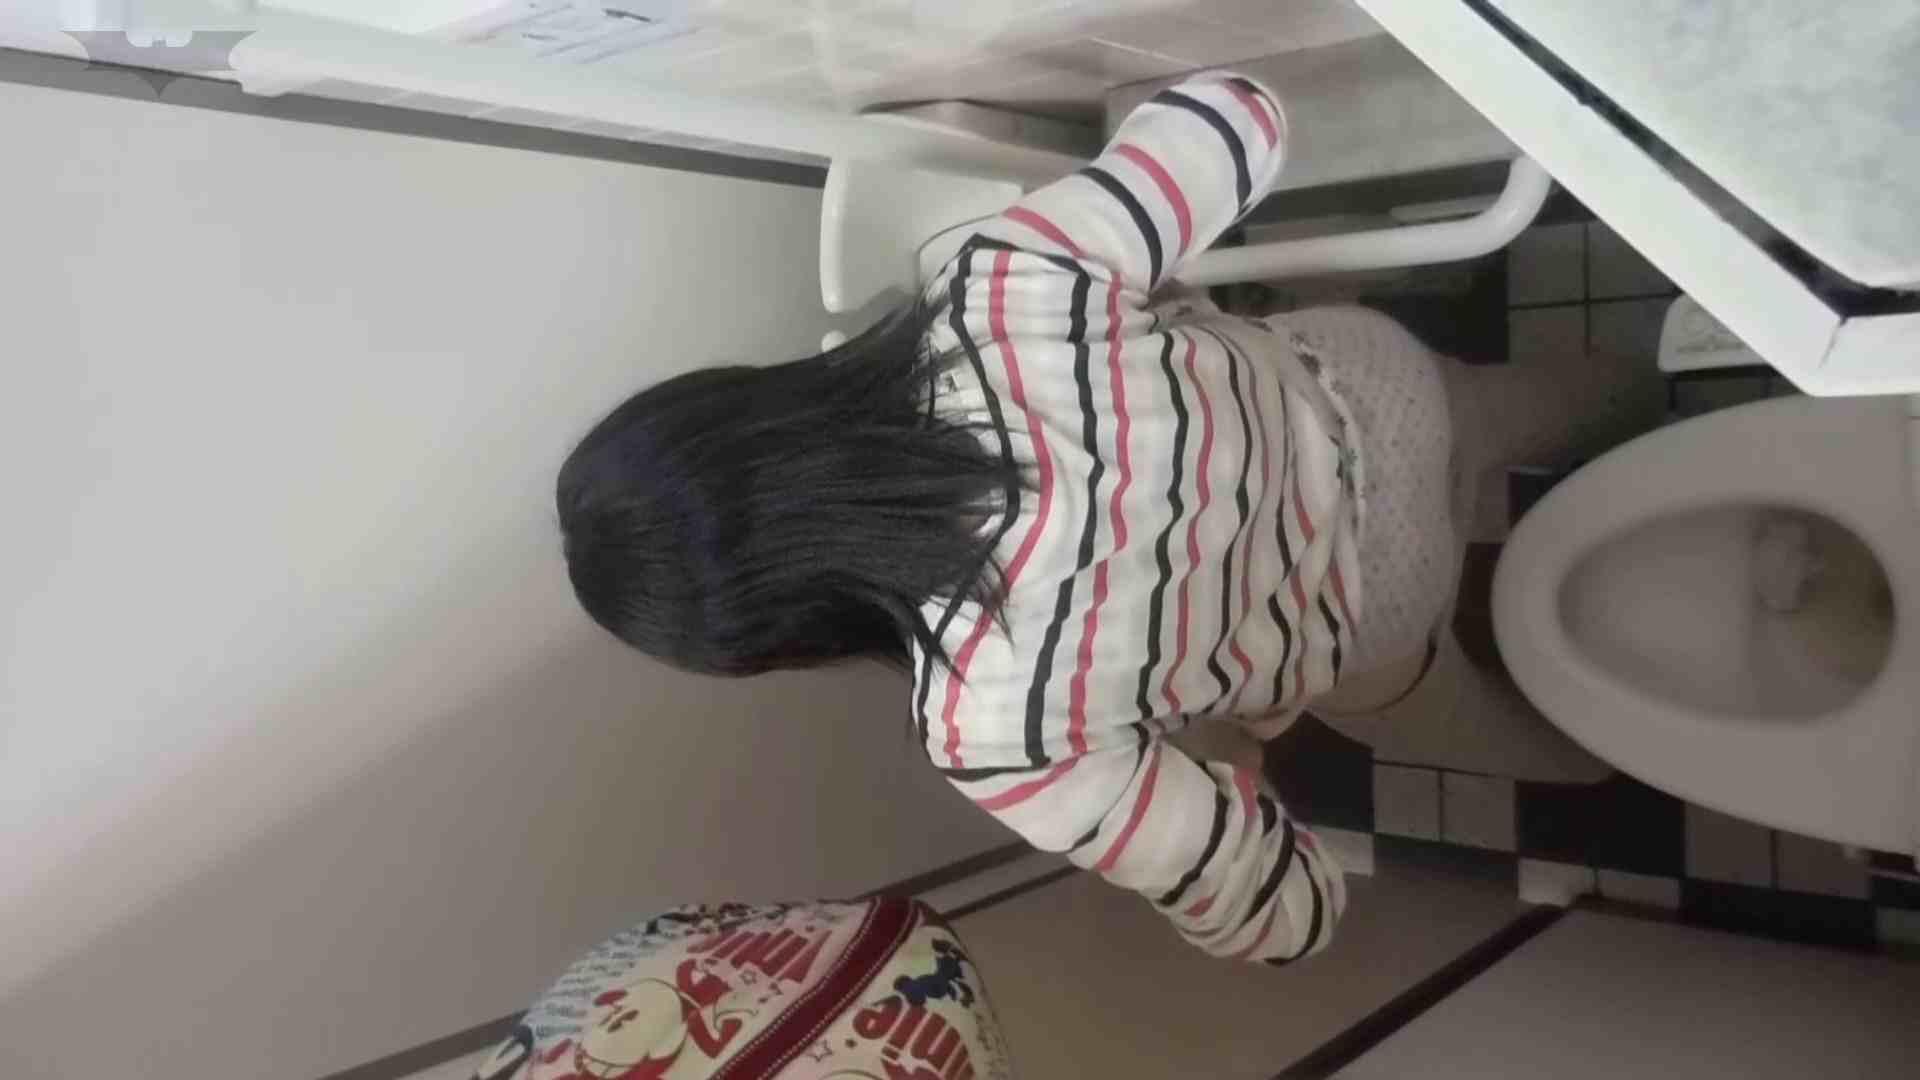 化粧室絵巻 駅舎編 VOL.22 季節外れの冬服特集!! OL   0  82連発 9